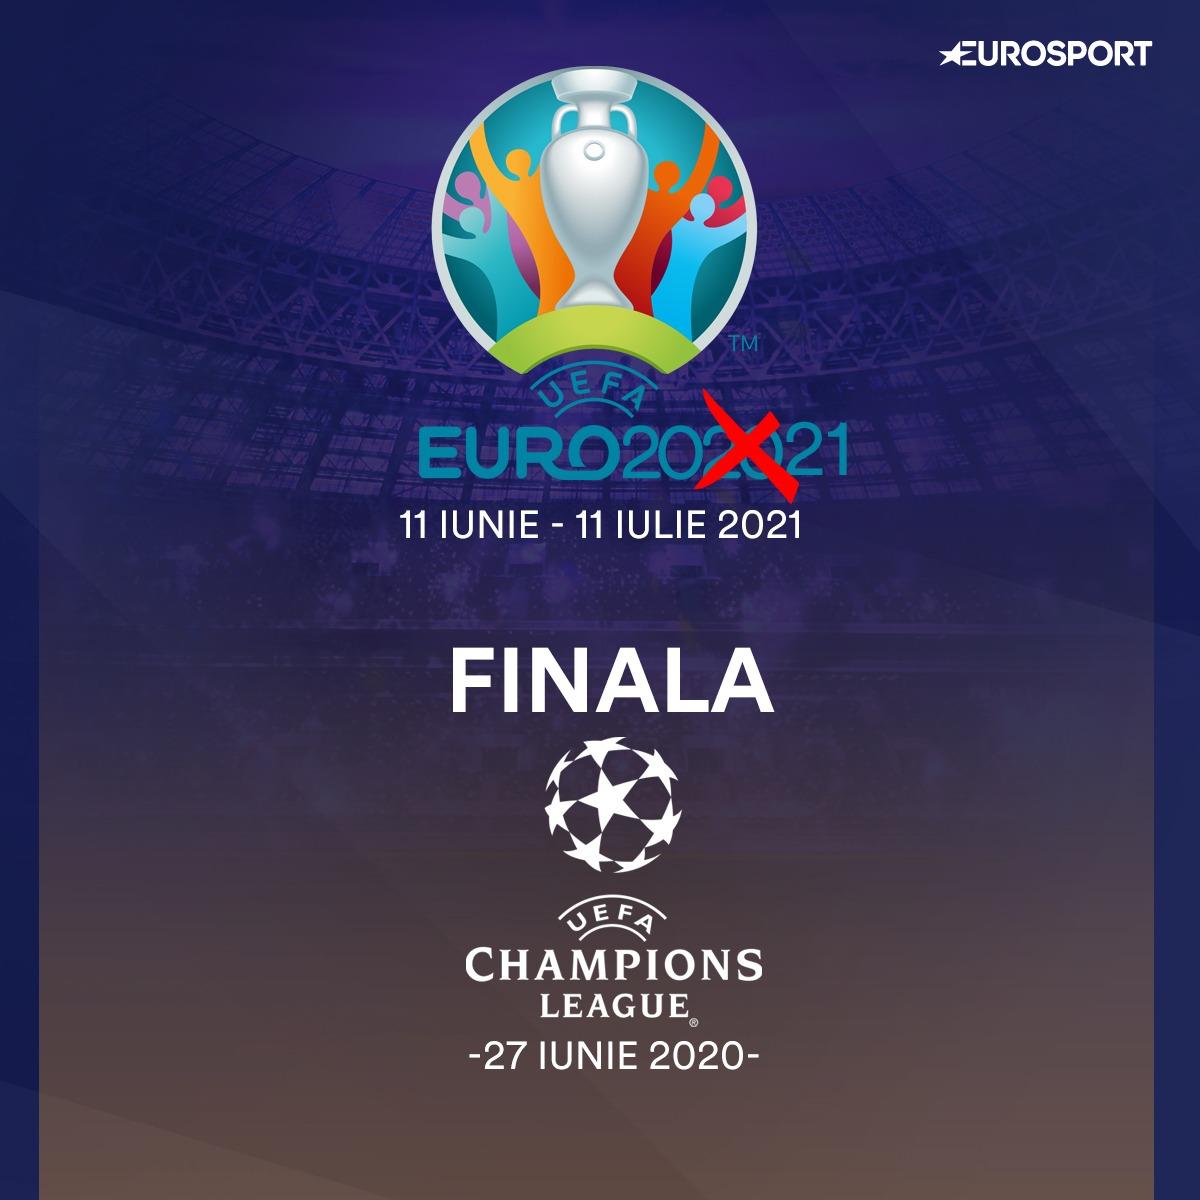 https://i.eurosport.com/2020/03/17/2795482.png